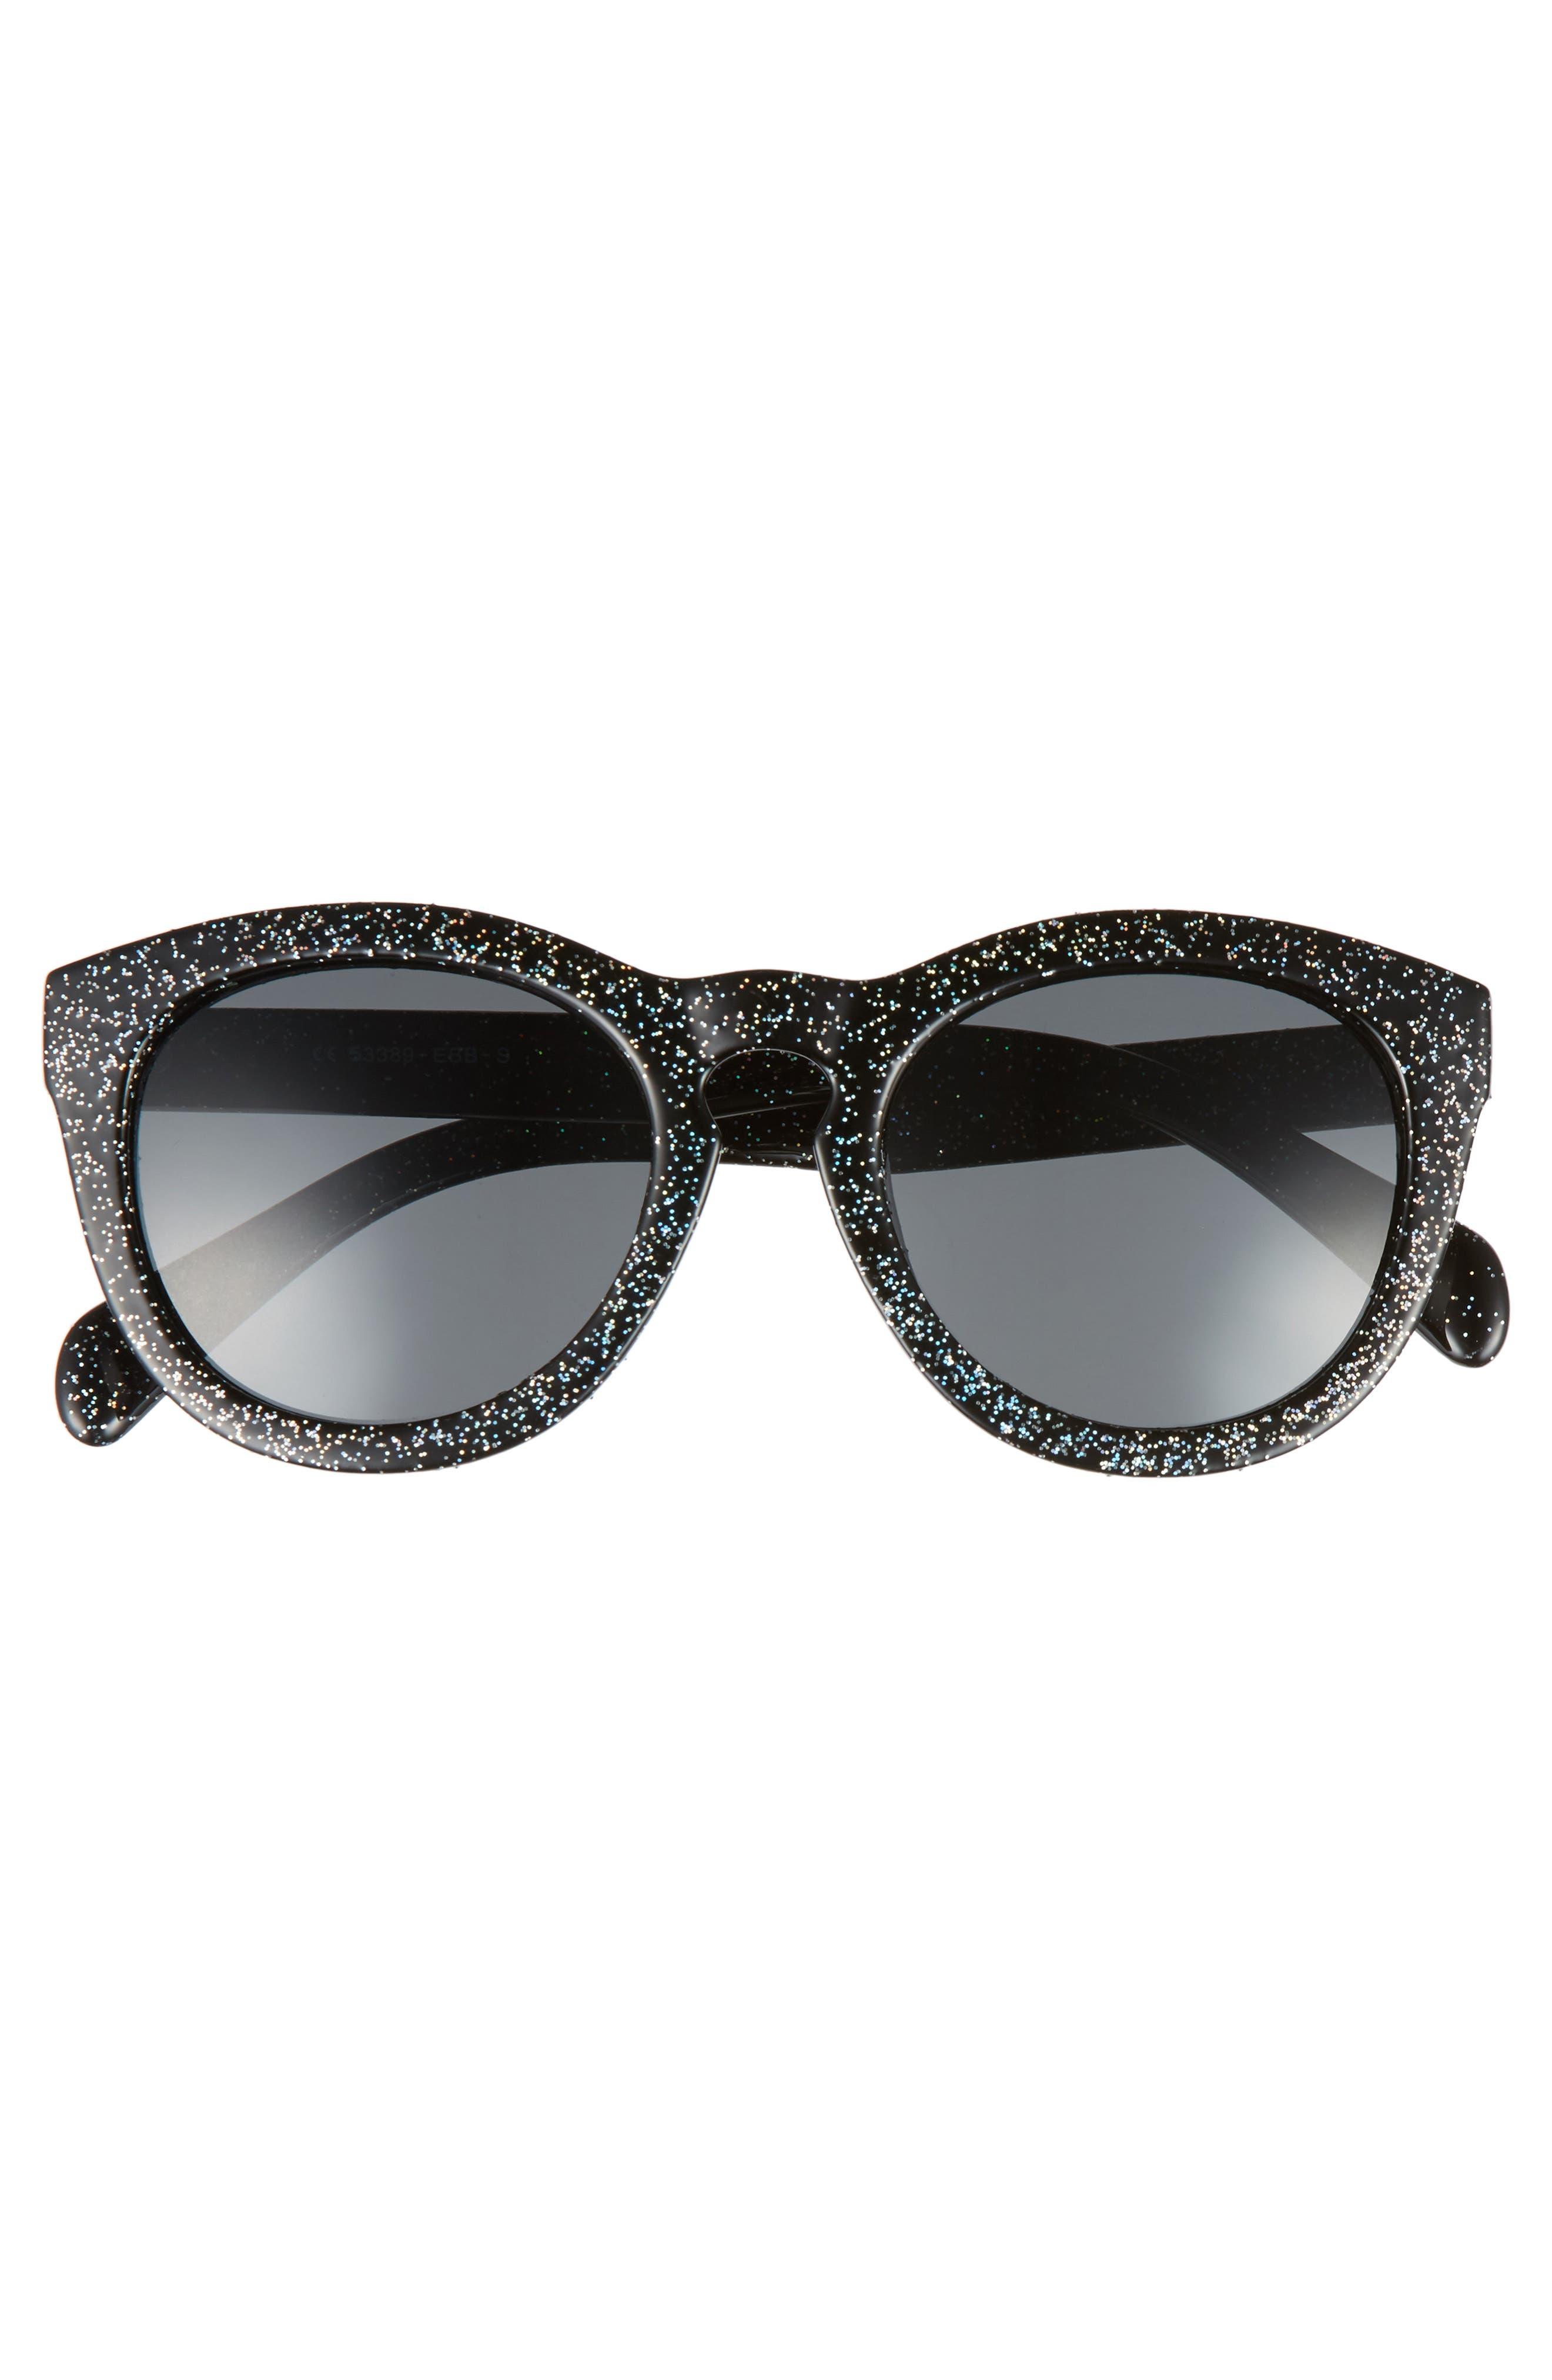 50mm Glitter Round Sunglasses,                             Alternate thumbnail 3, color,